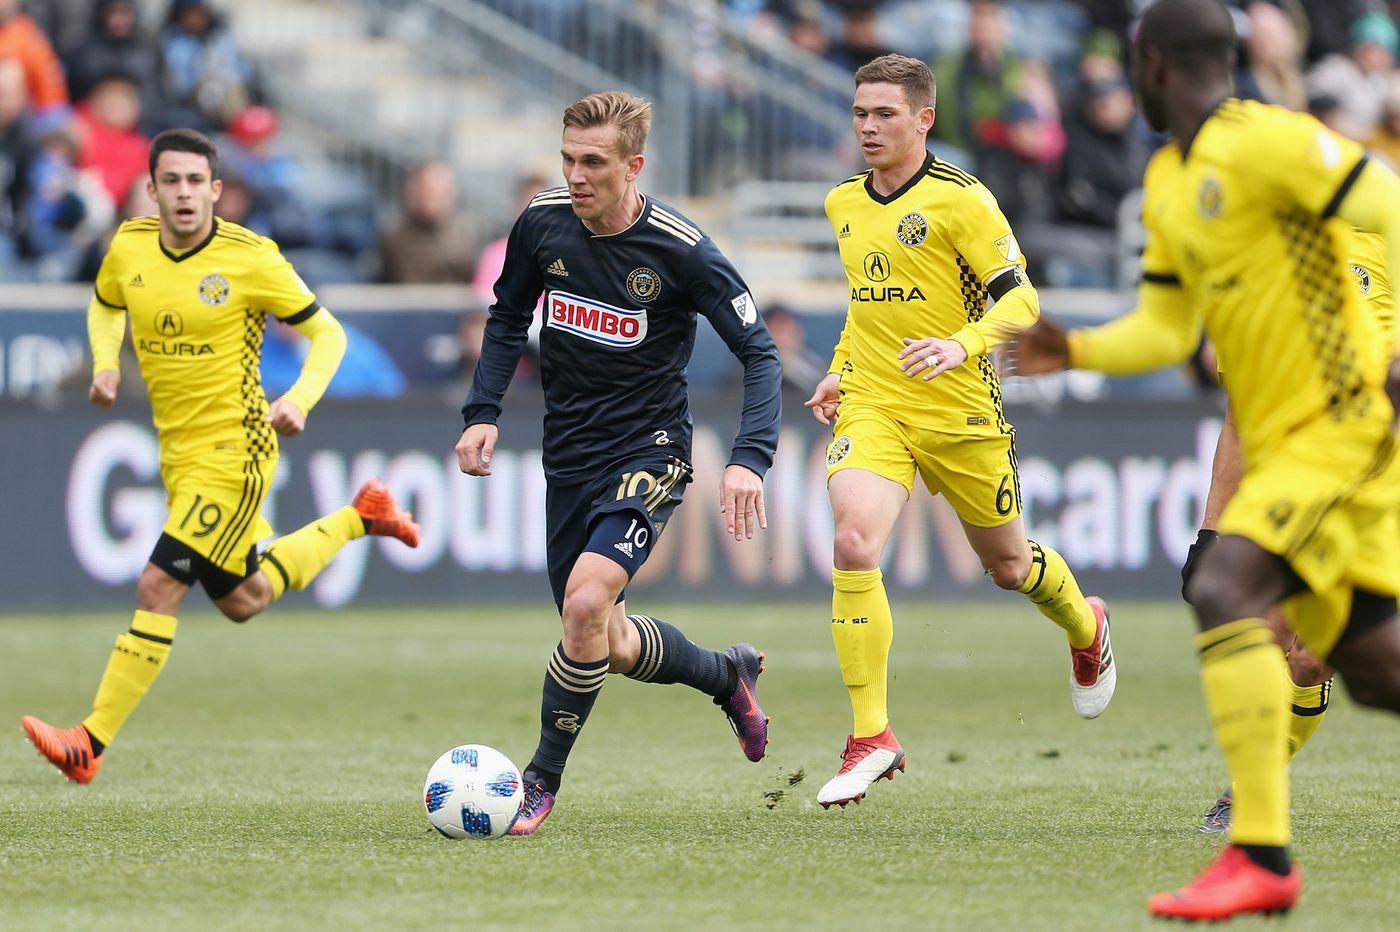 dcf017468 Philadelphia Union 2018 player salaries as of May 1